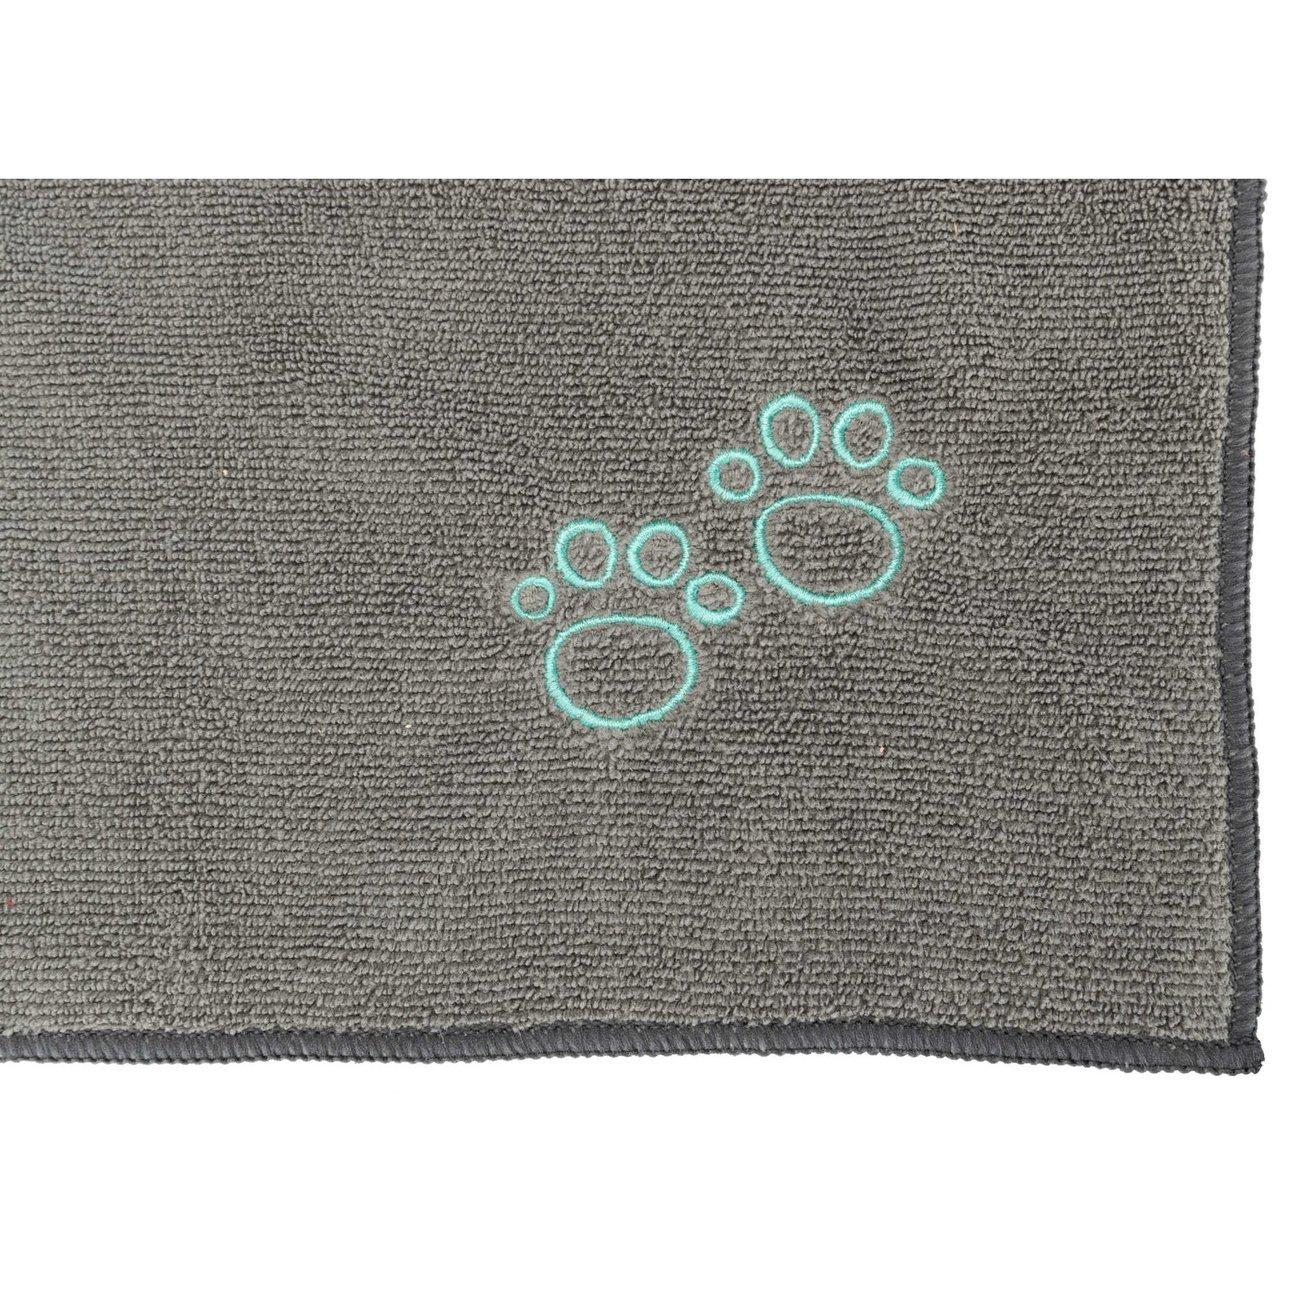 TRIXIE Hundehandtuch 2350, Bild 4